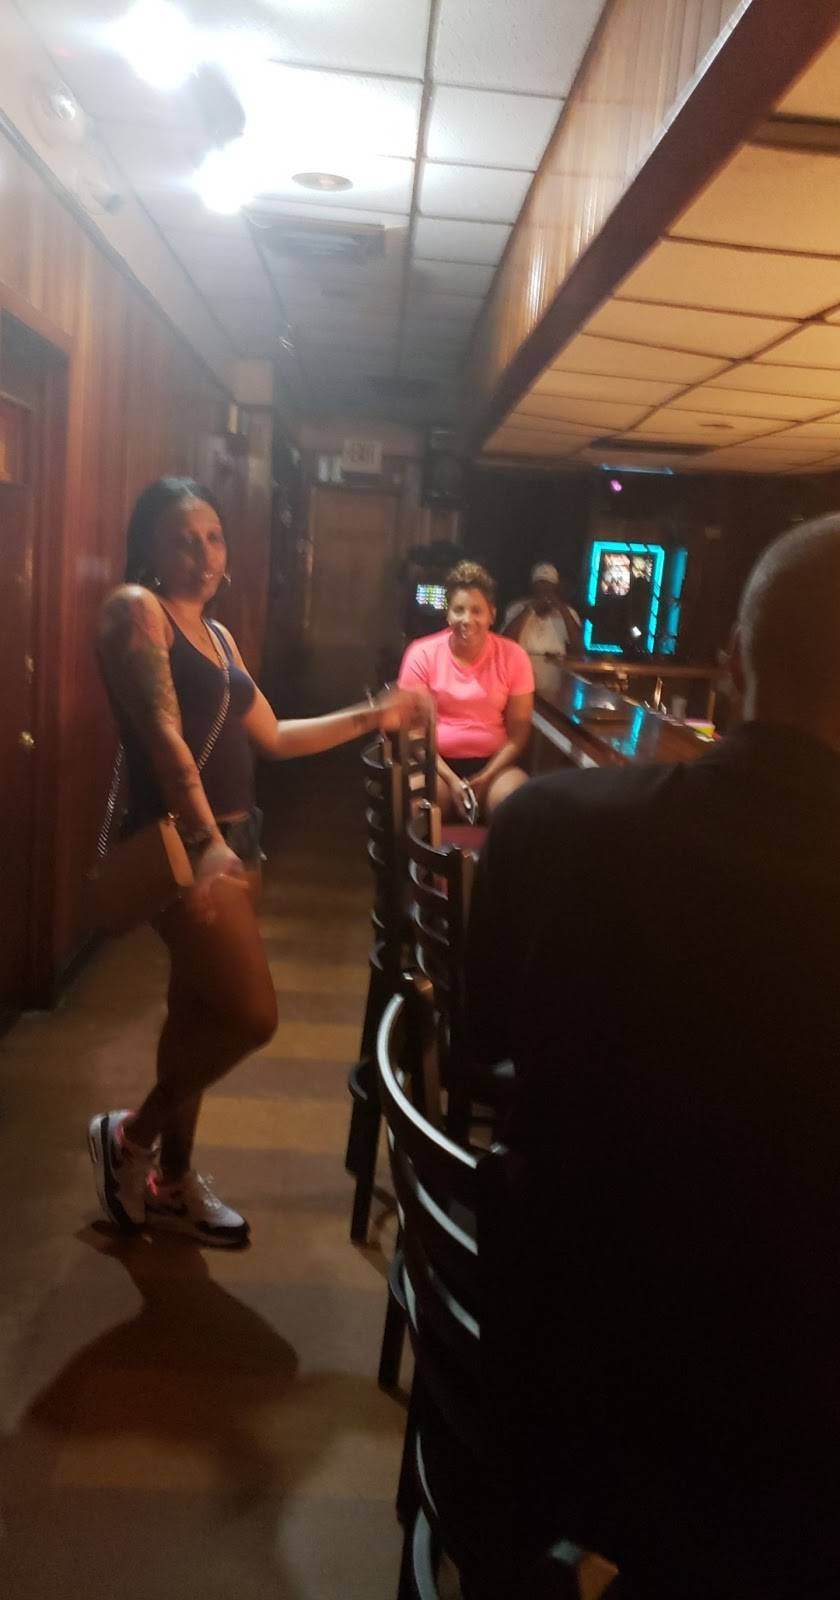 Garrison Lounge - night club  | Photo 5 of 6 | Address: 3403 Clifton Ave, Baltimore, MD 21216, USA | Phone: (410) 947-2849